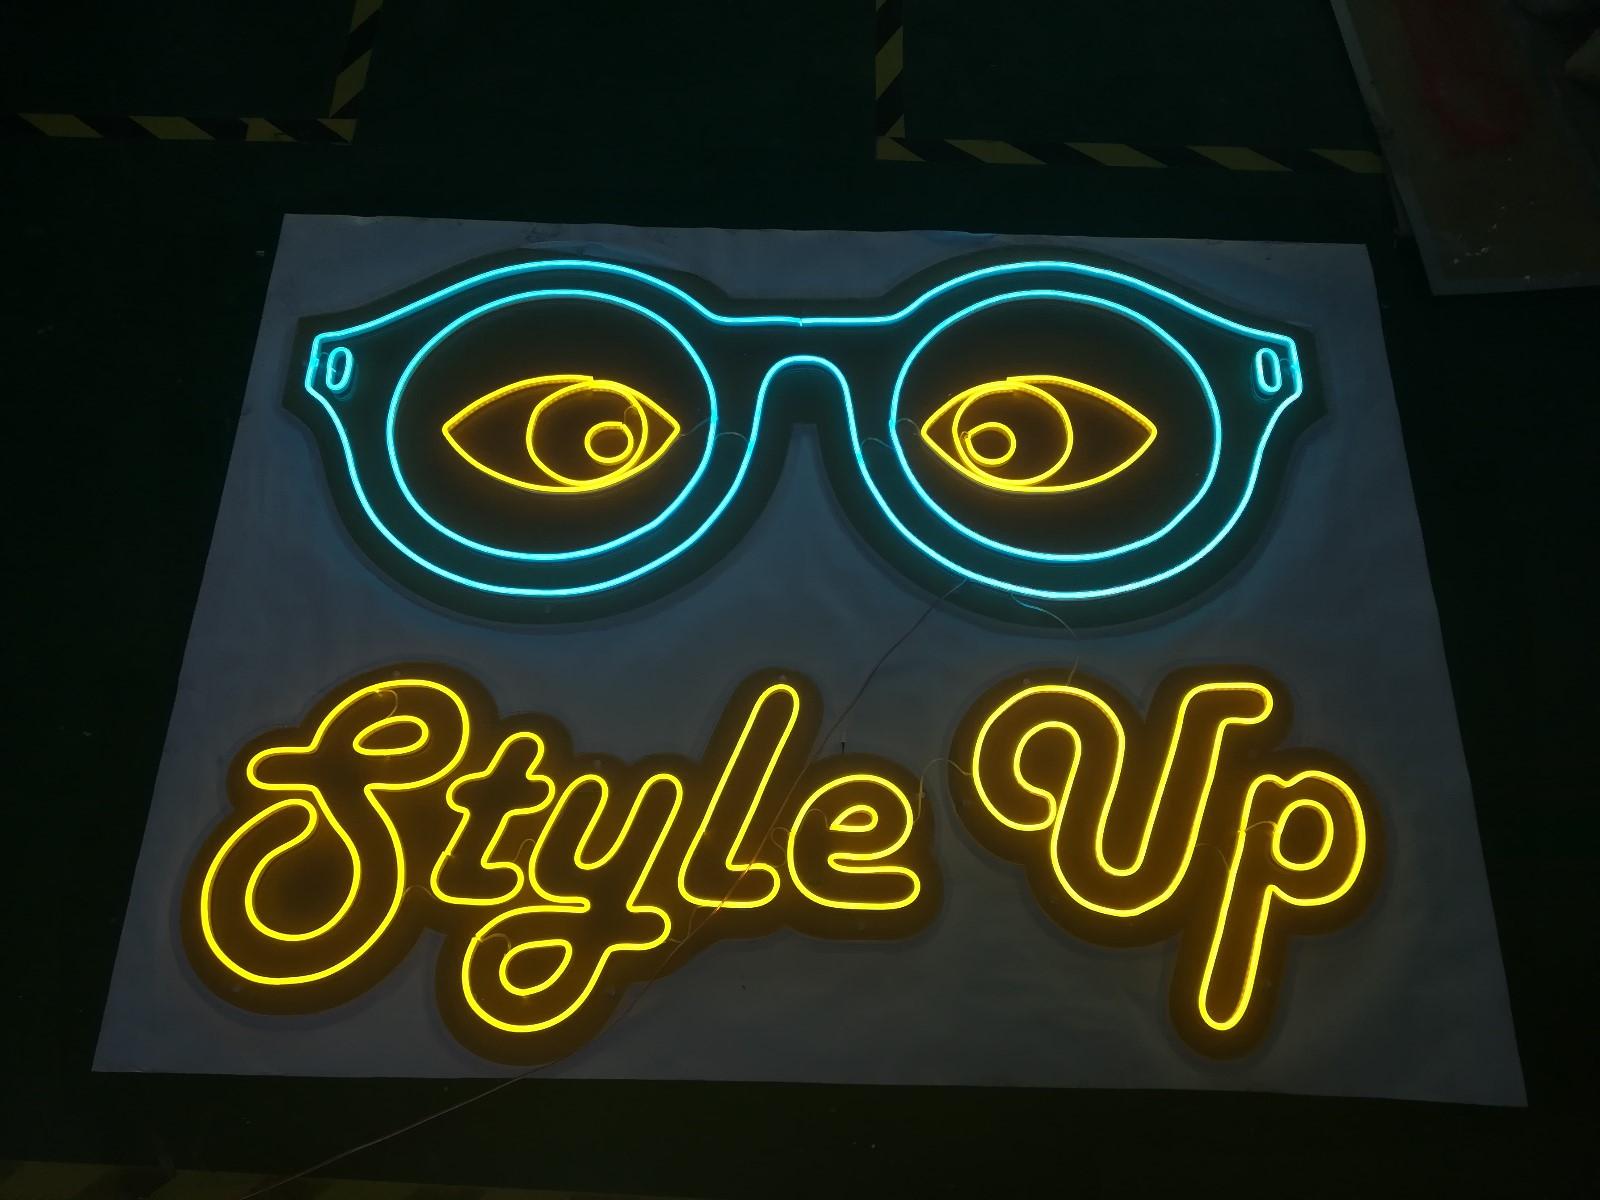 neon light letter led sign lighted signs